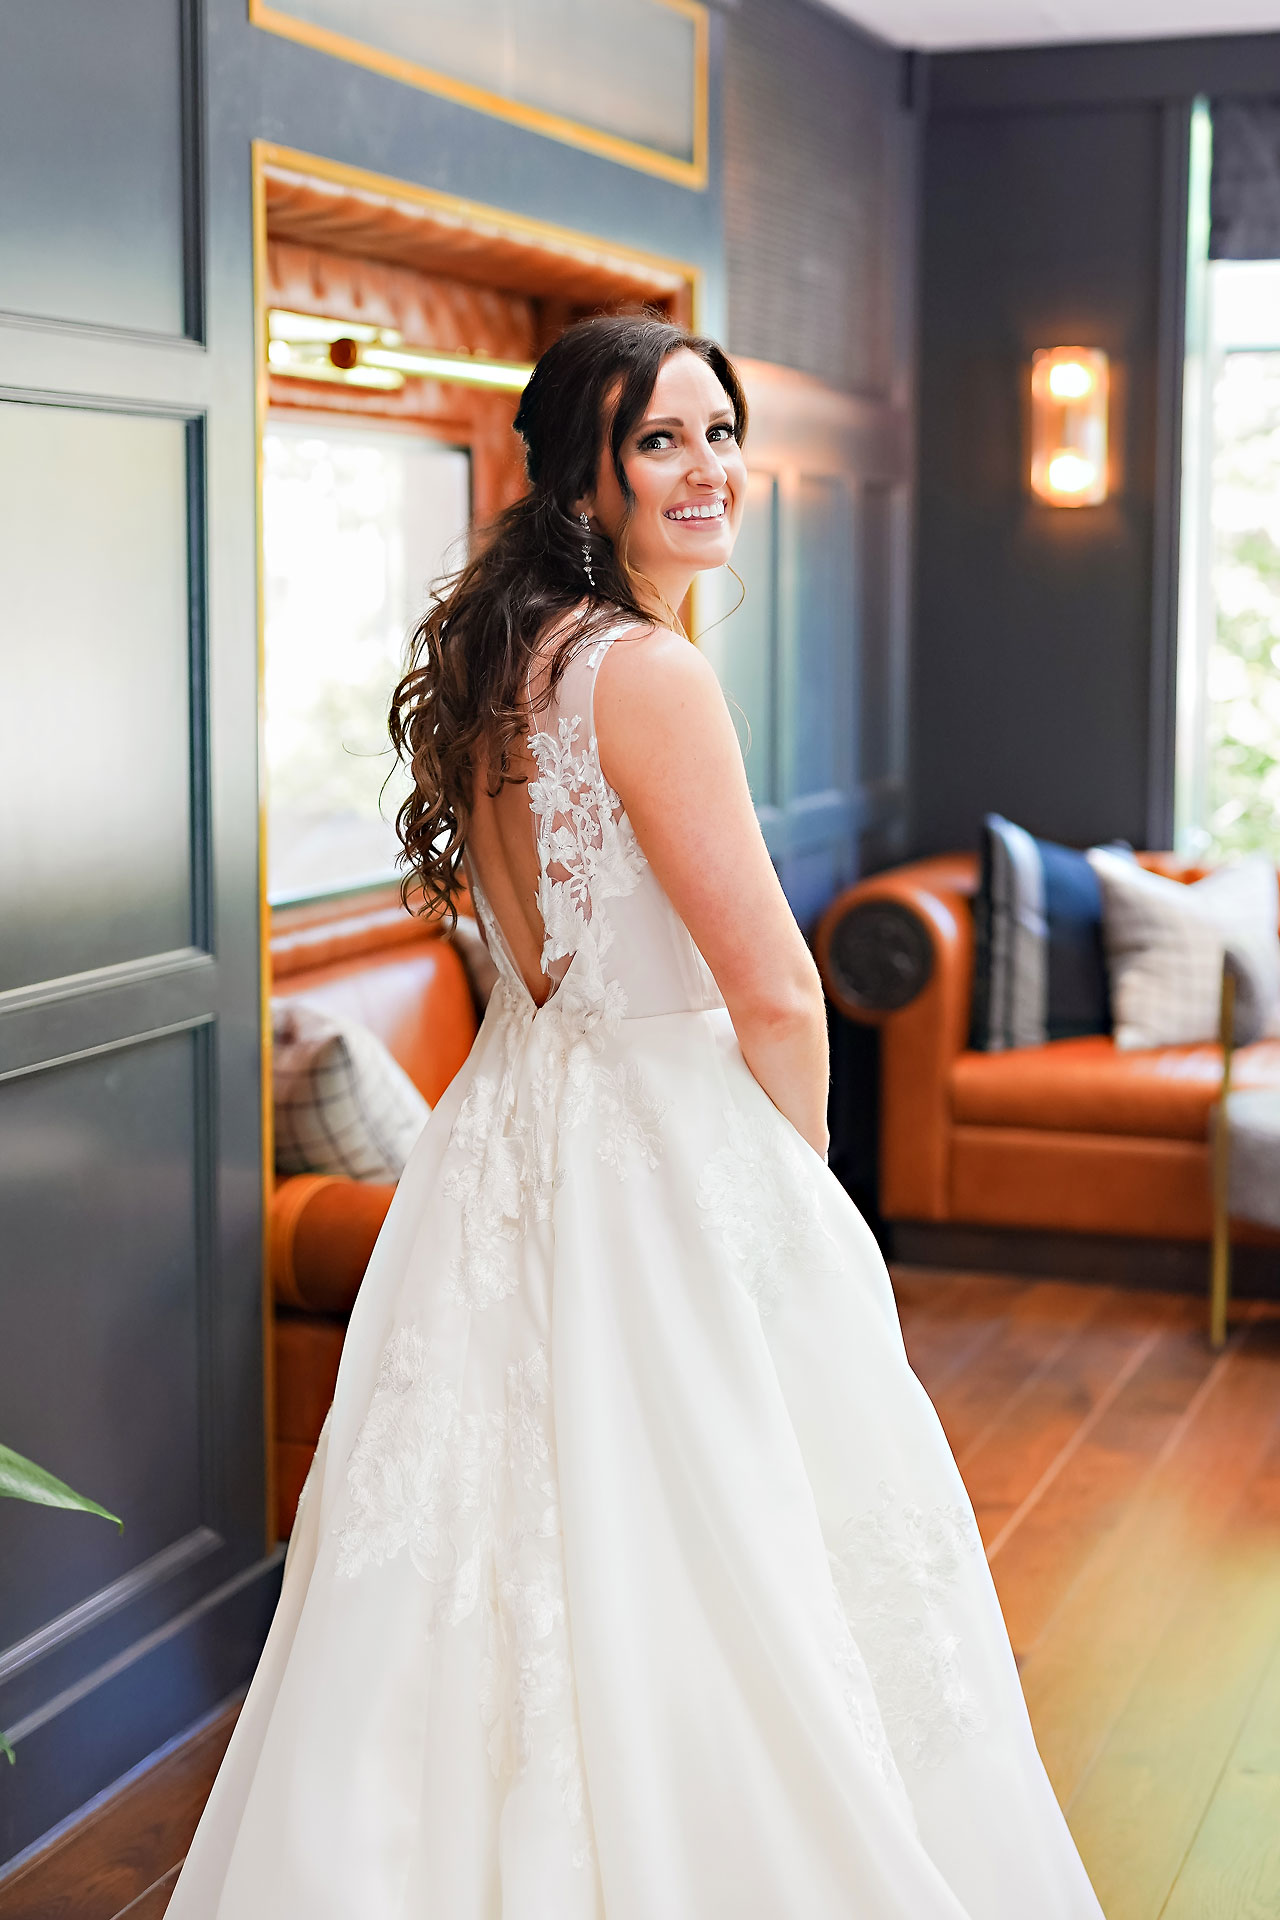 MacKinze John Lafayette Indiana Purdue Wedding 045